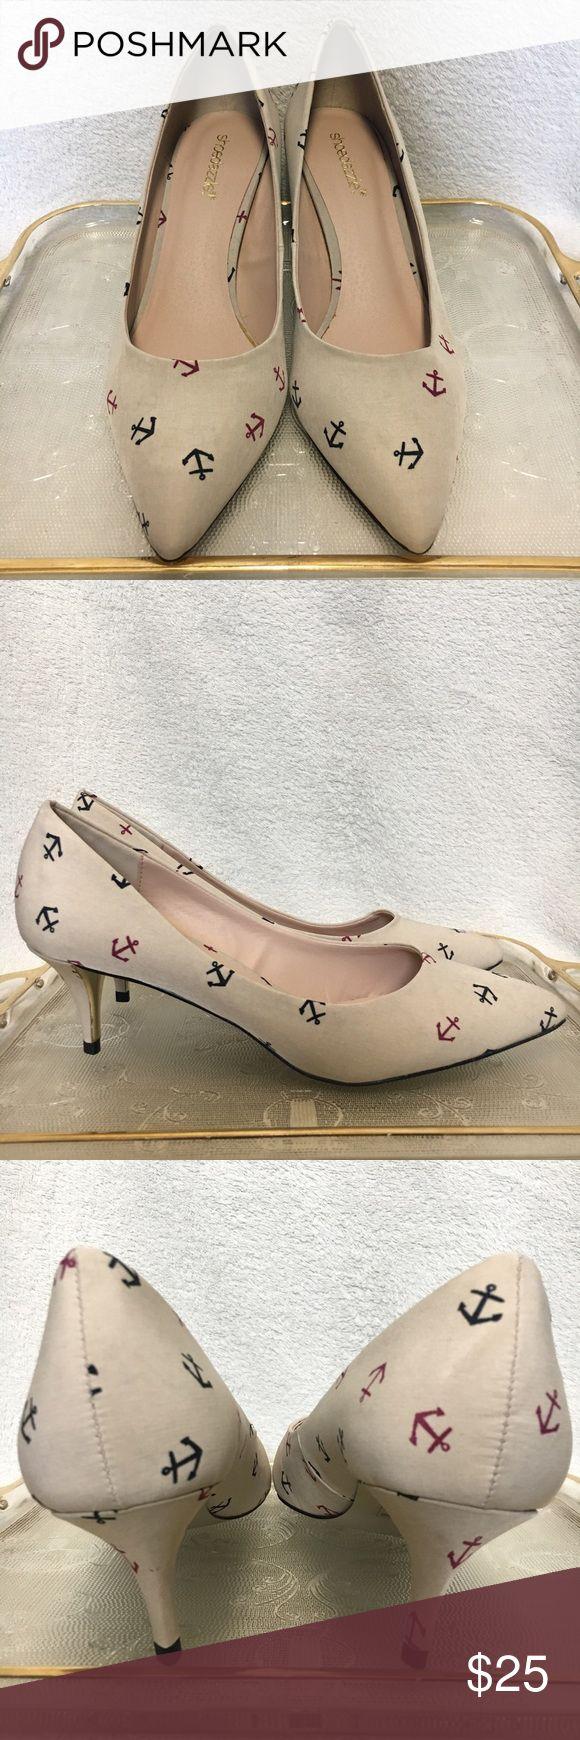 "Shoe Dazzle Heels Pumps Shoe Dazzle Heels Shoe size: 9 condition: like new never worn heels: 2.5"" Shoe Dazzle Shoes Heels"